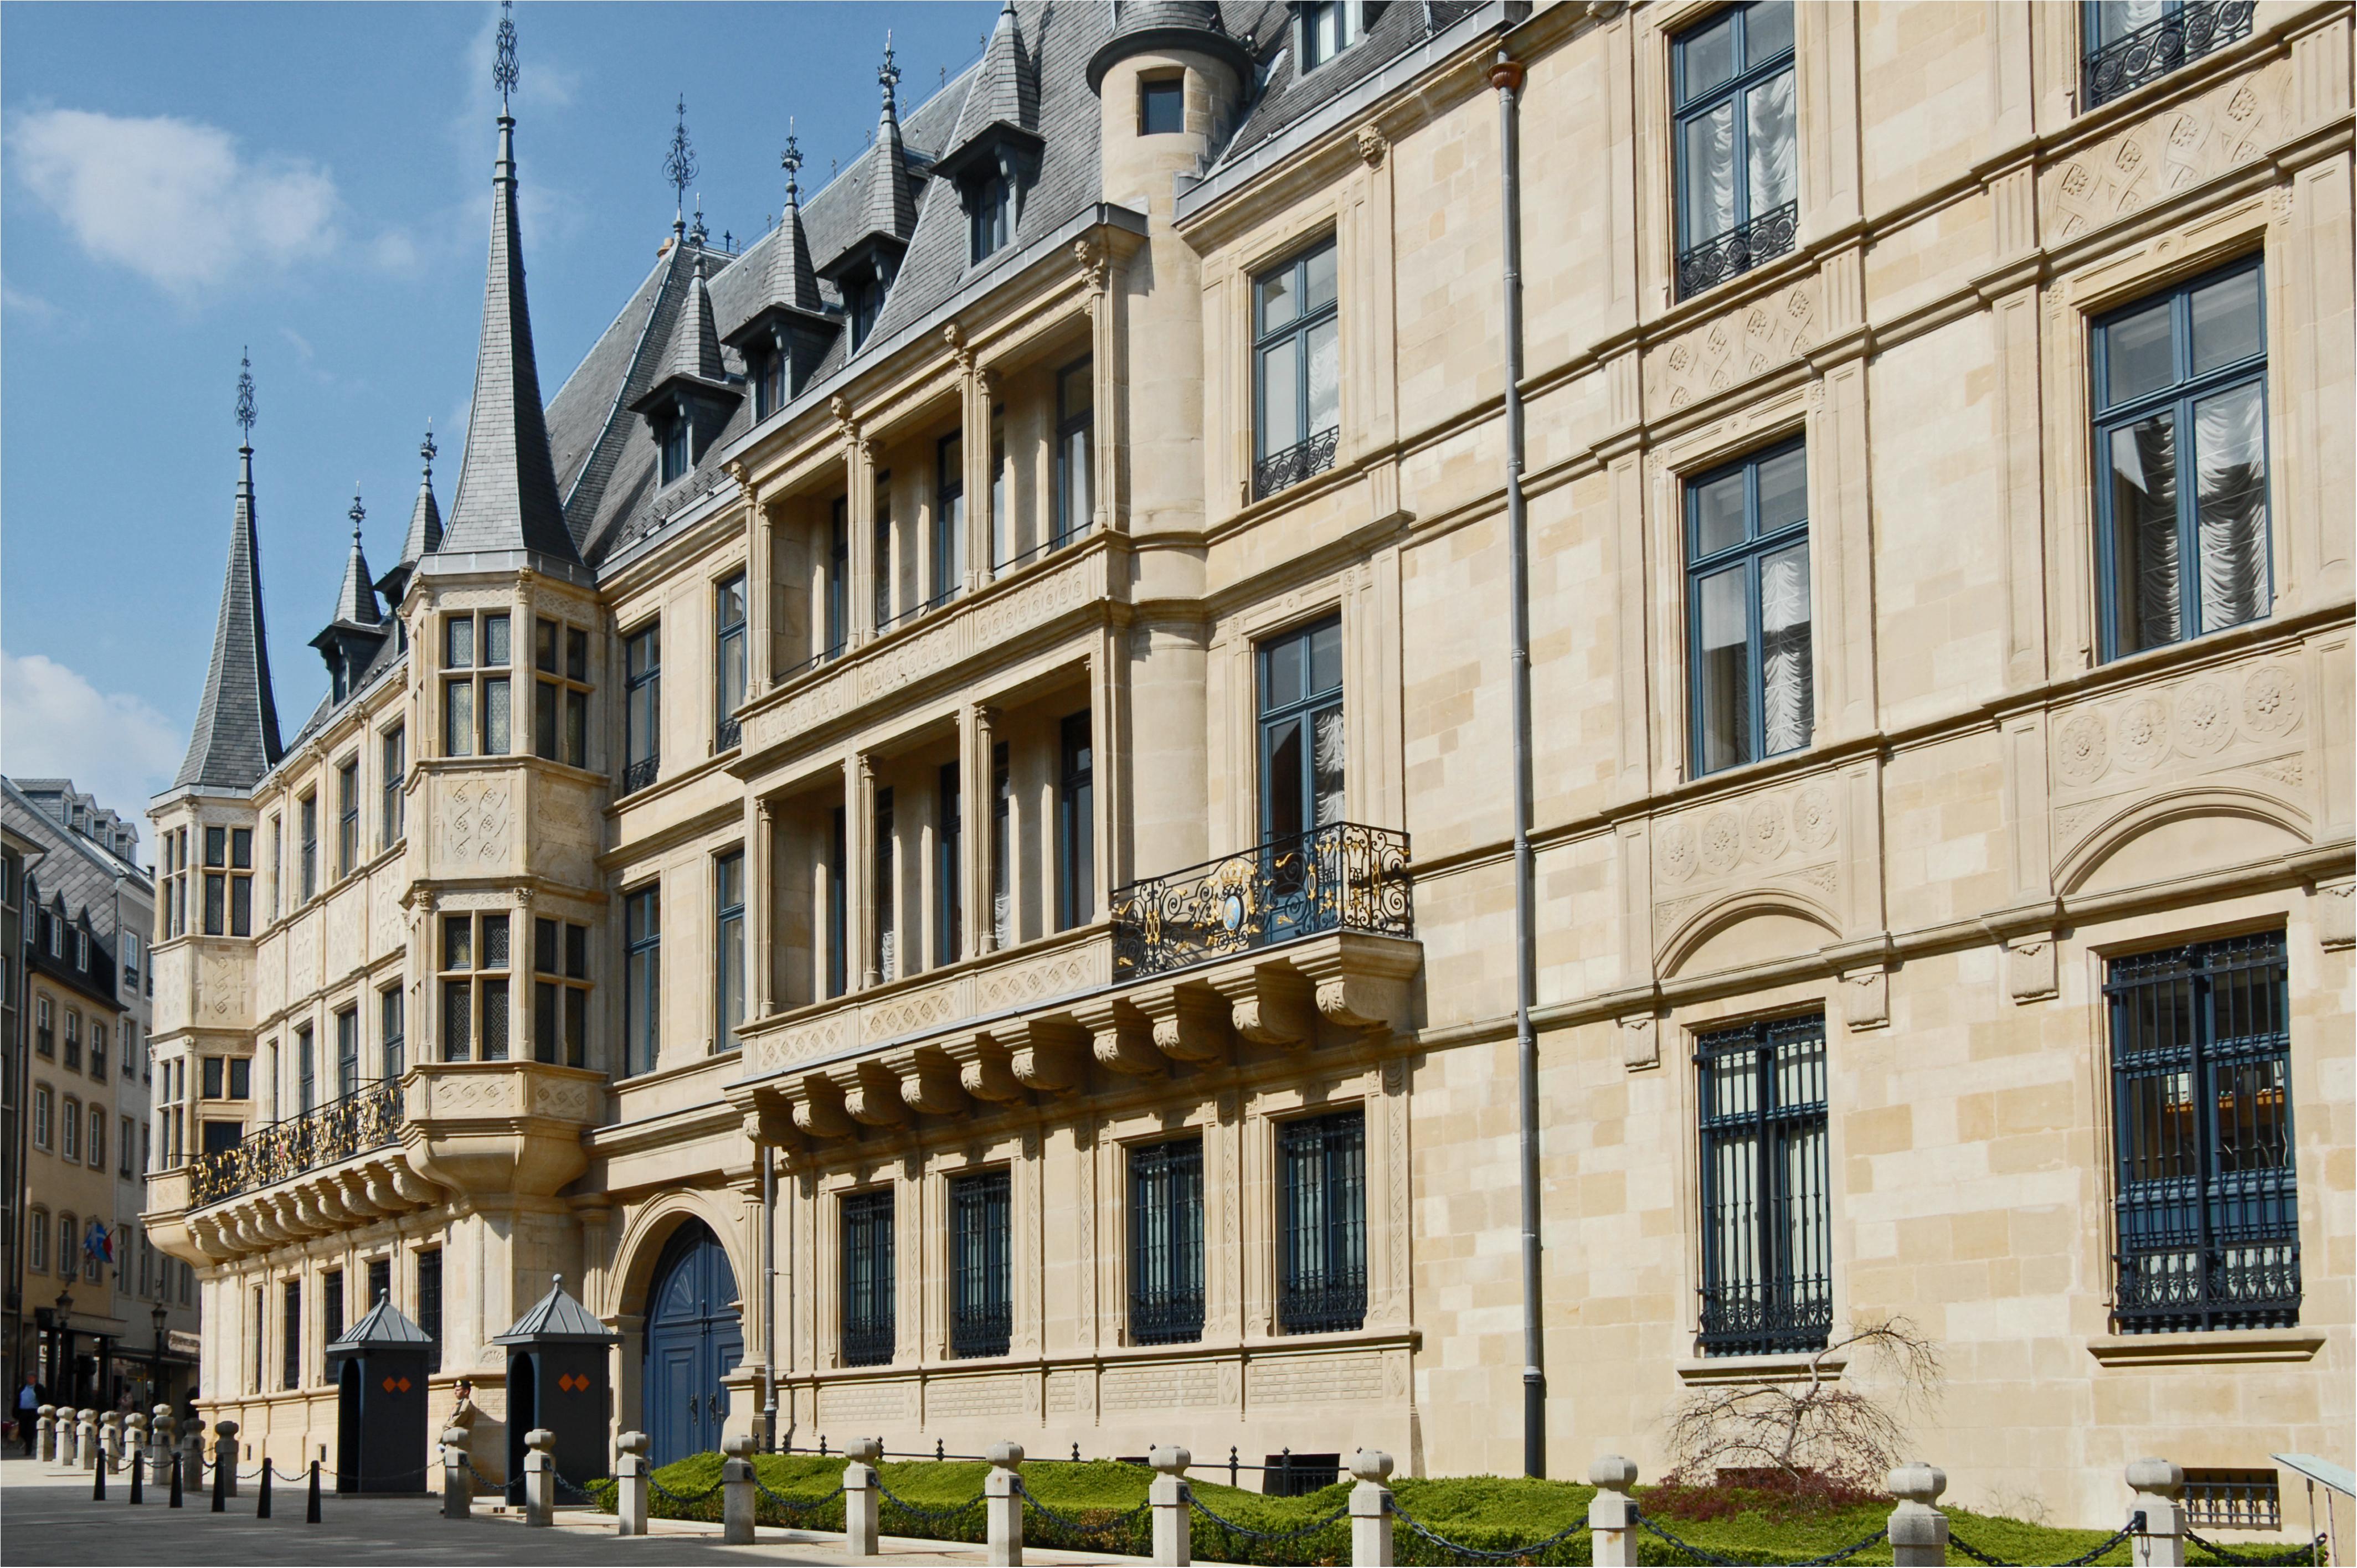 10 paises hermosos que visitar antes de morir im genes for Republica francesa wikipedia